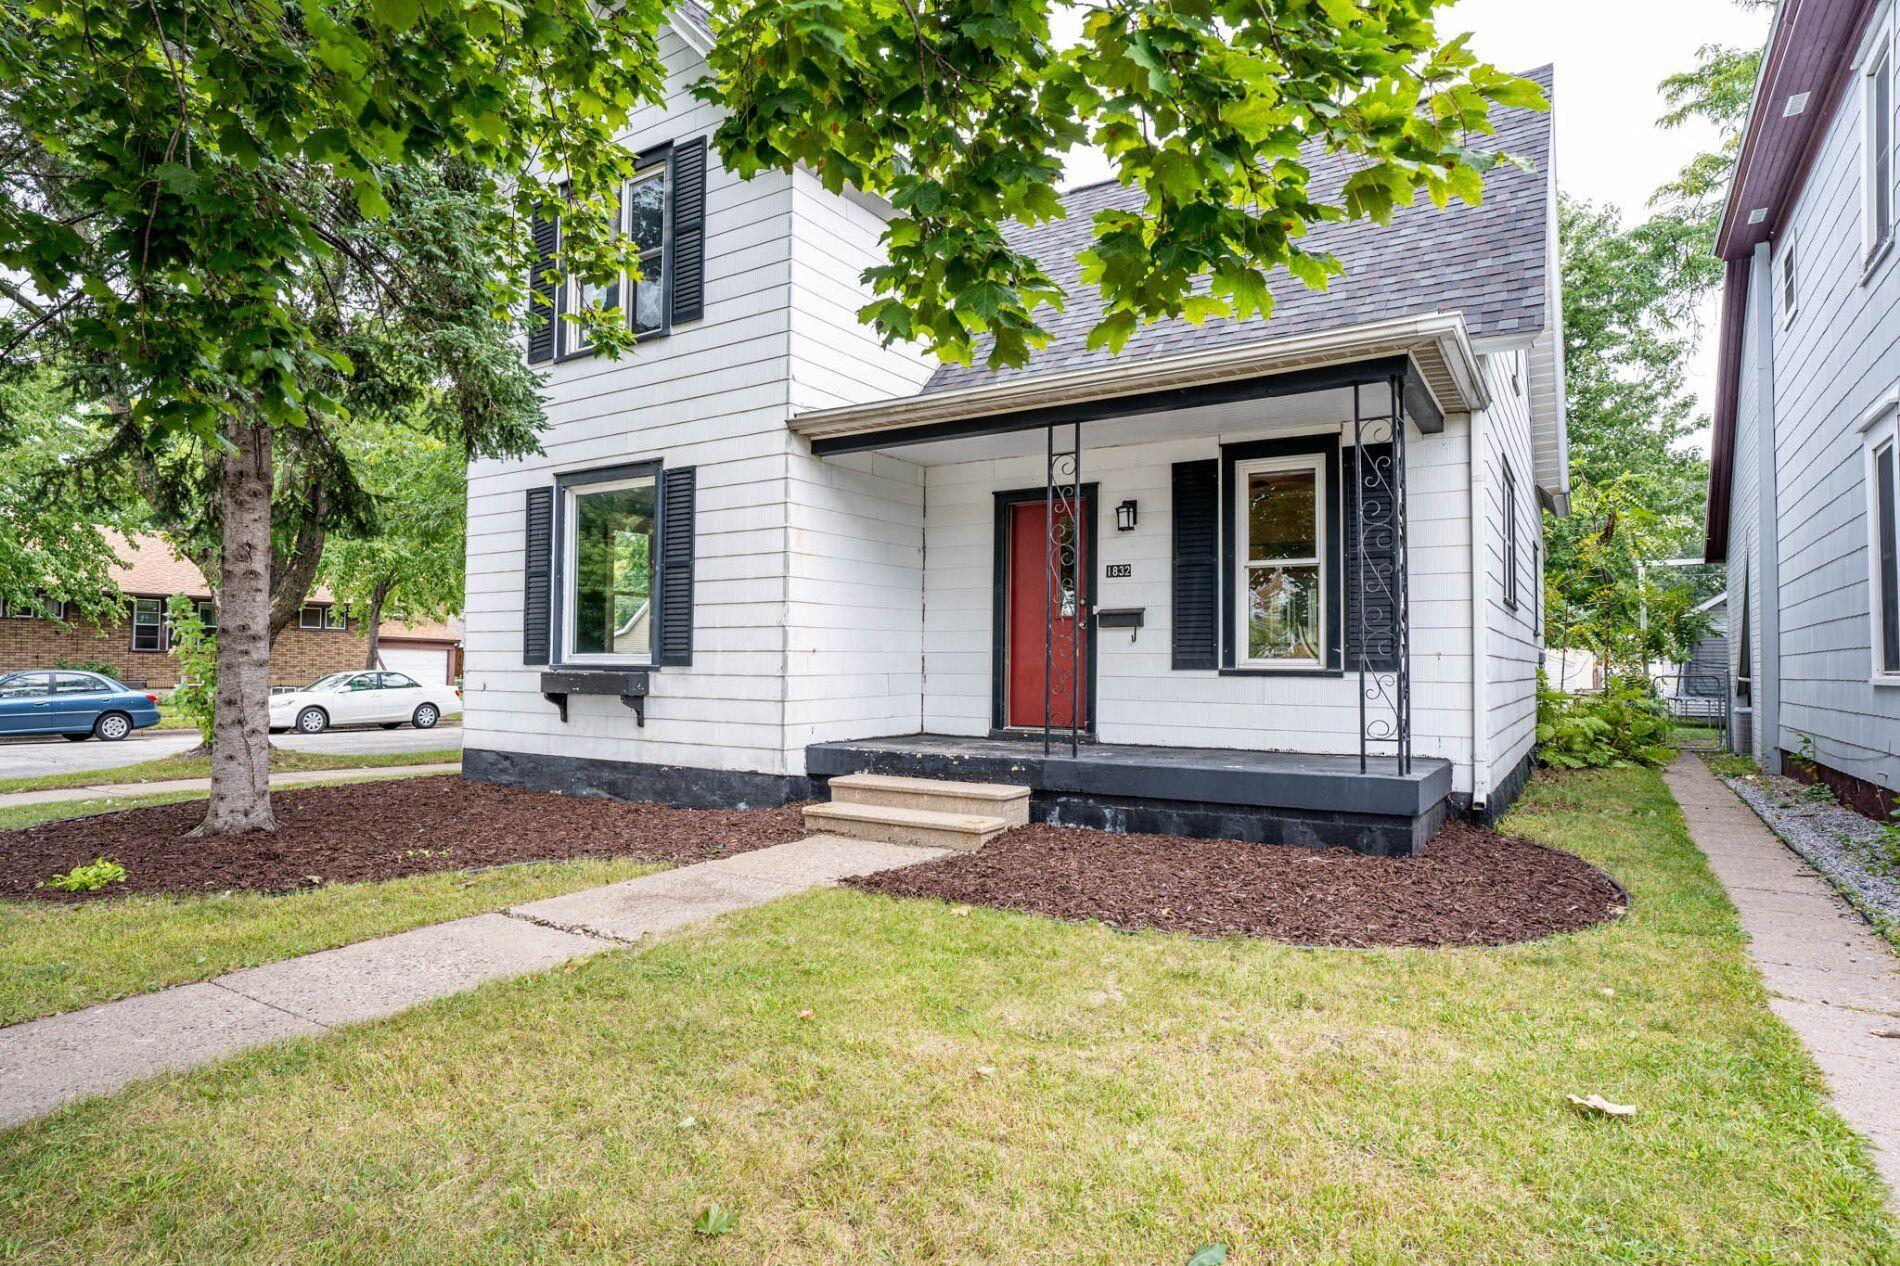 1832 Wood St, La Crosse, WI 54603 - MLS#: 1766492